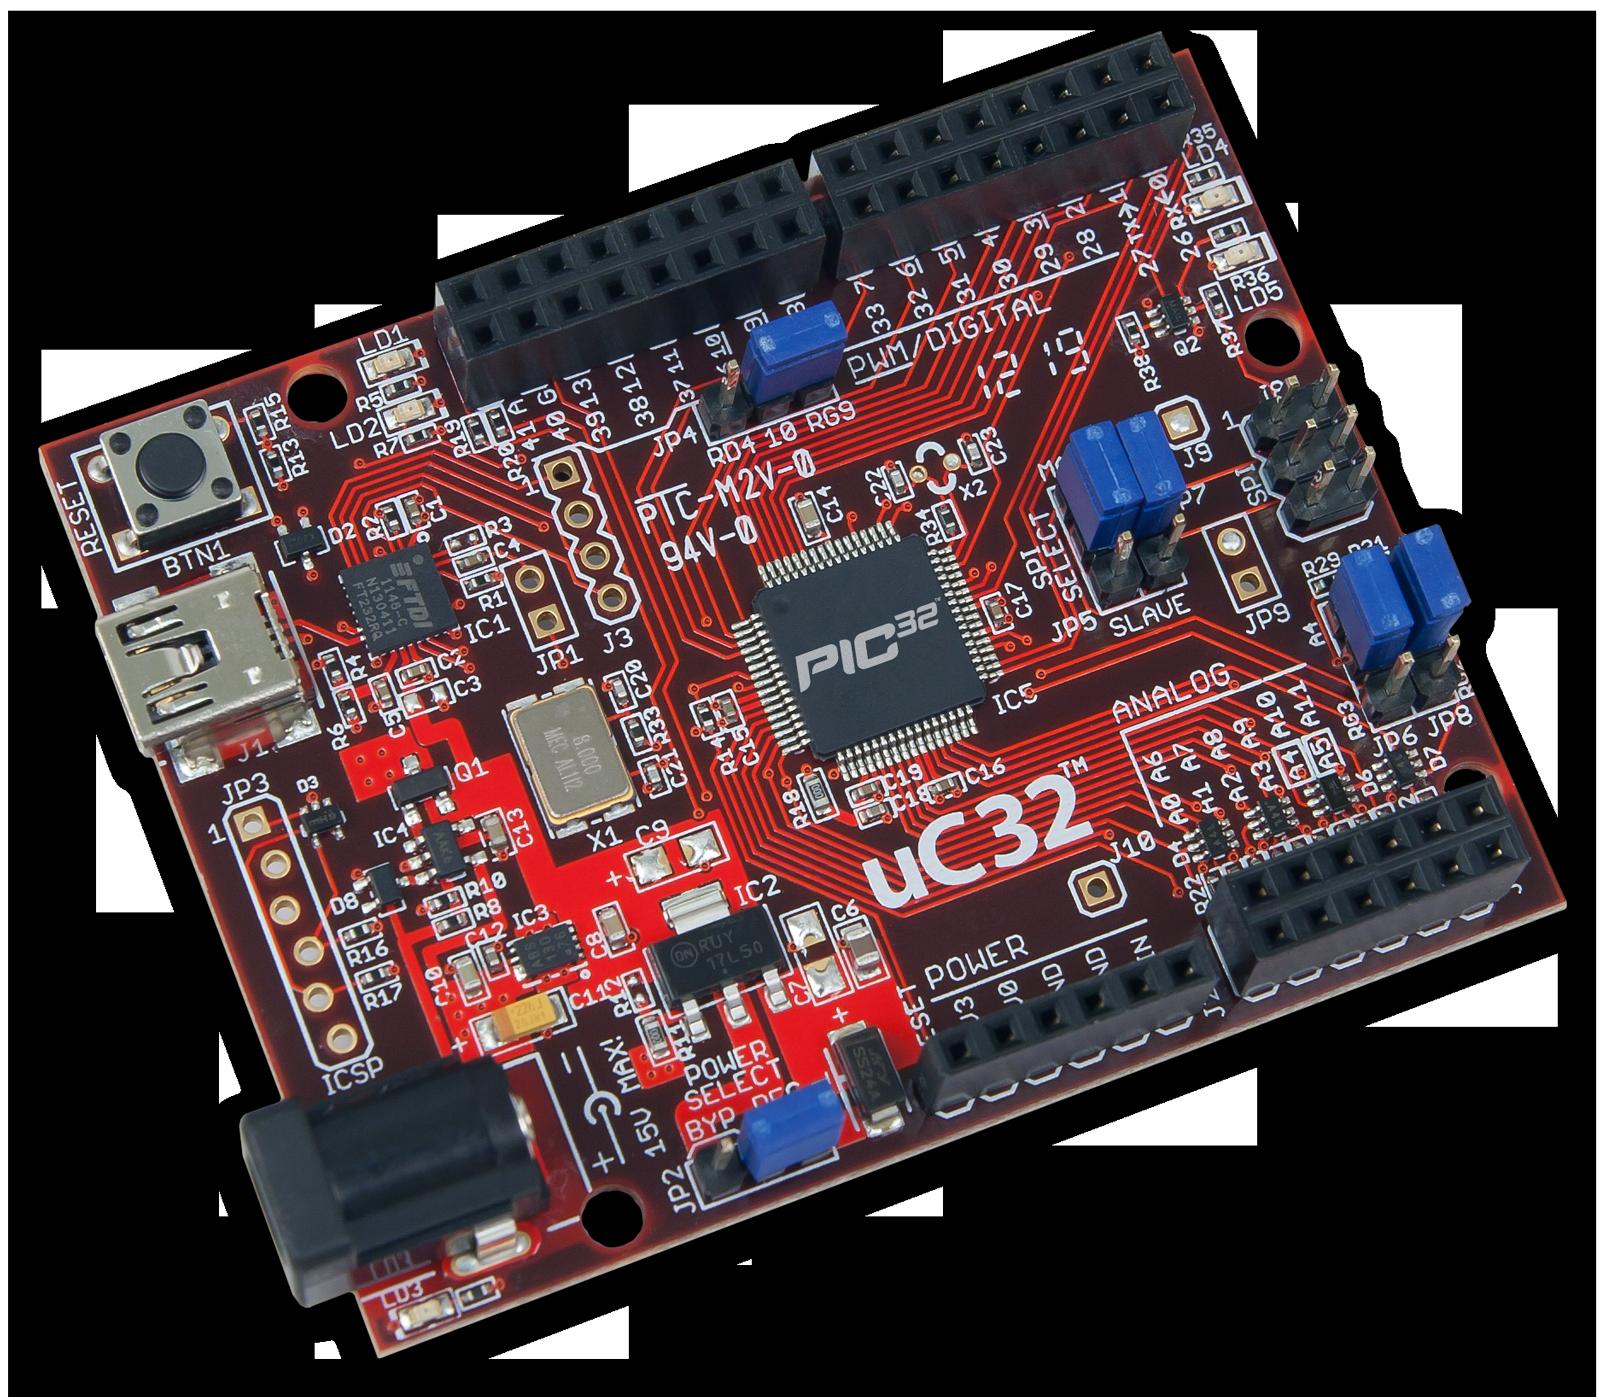 chipkit_uc32:chipkit-uc32-obl-1600.png